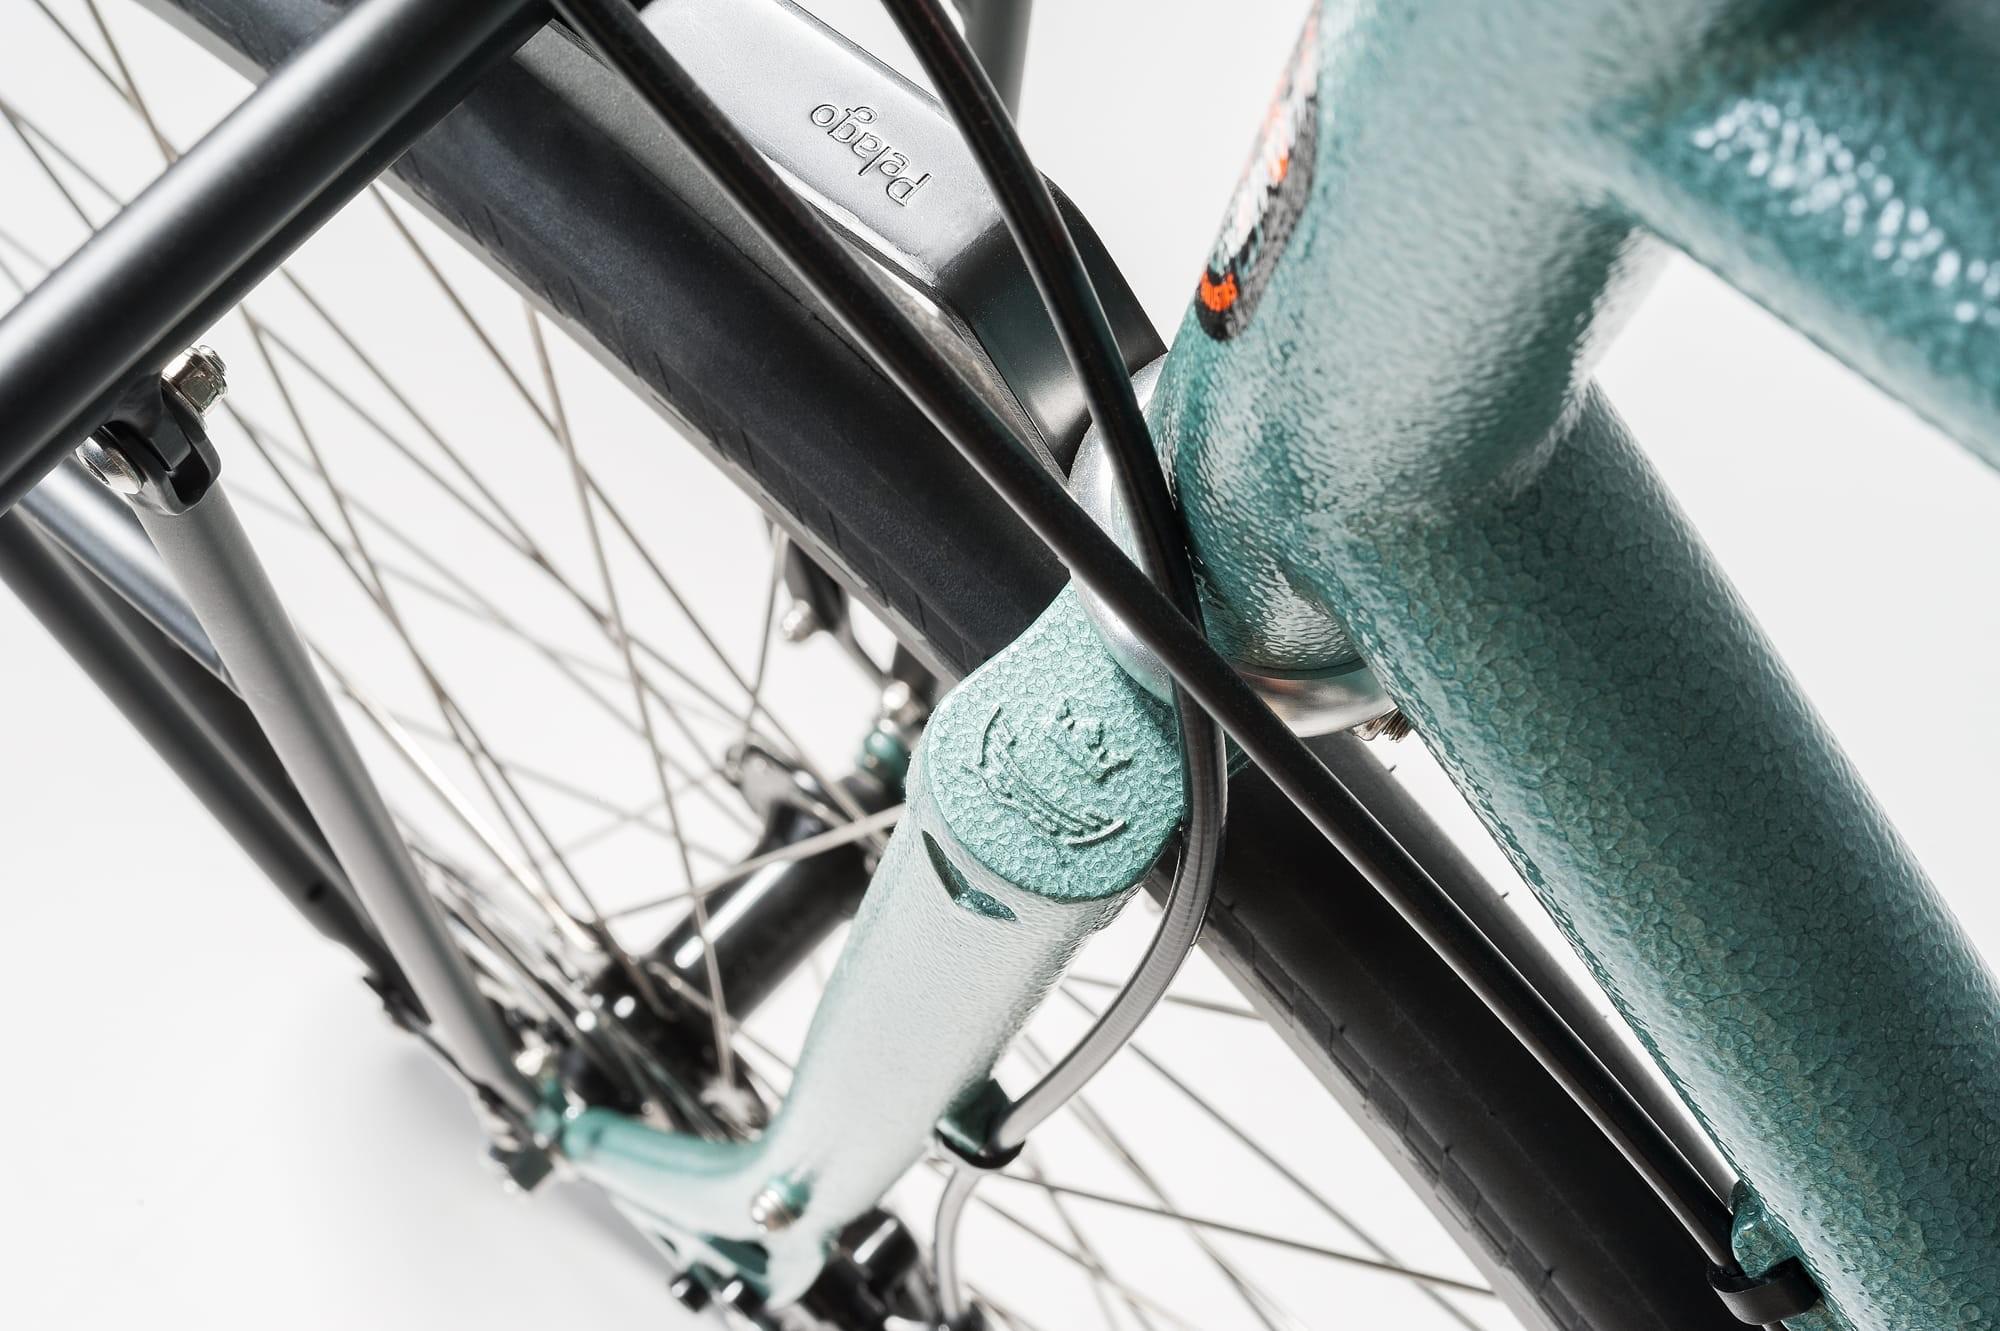 05_fw16_bike_details